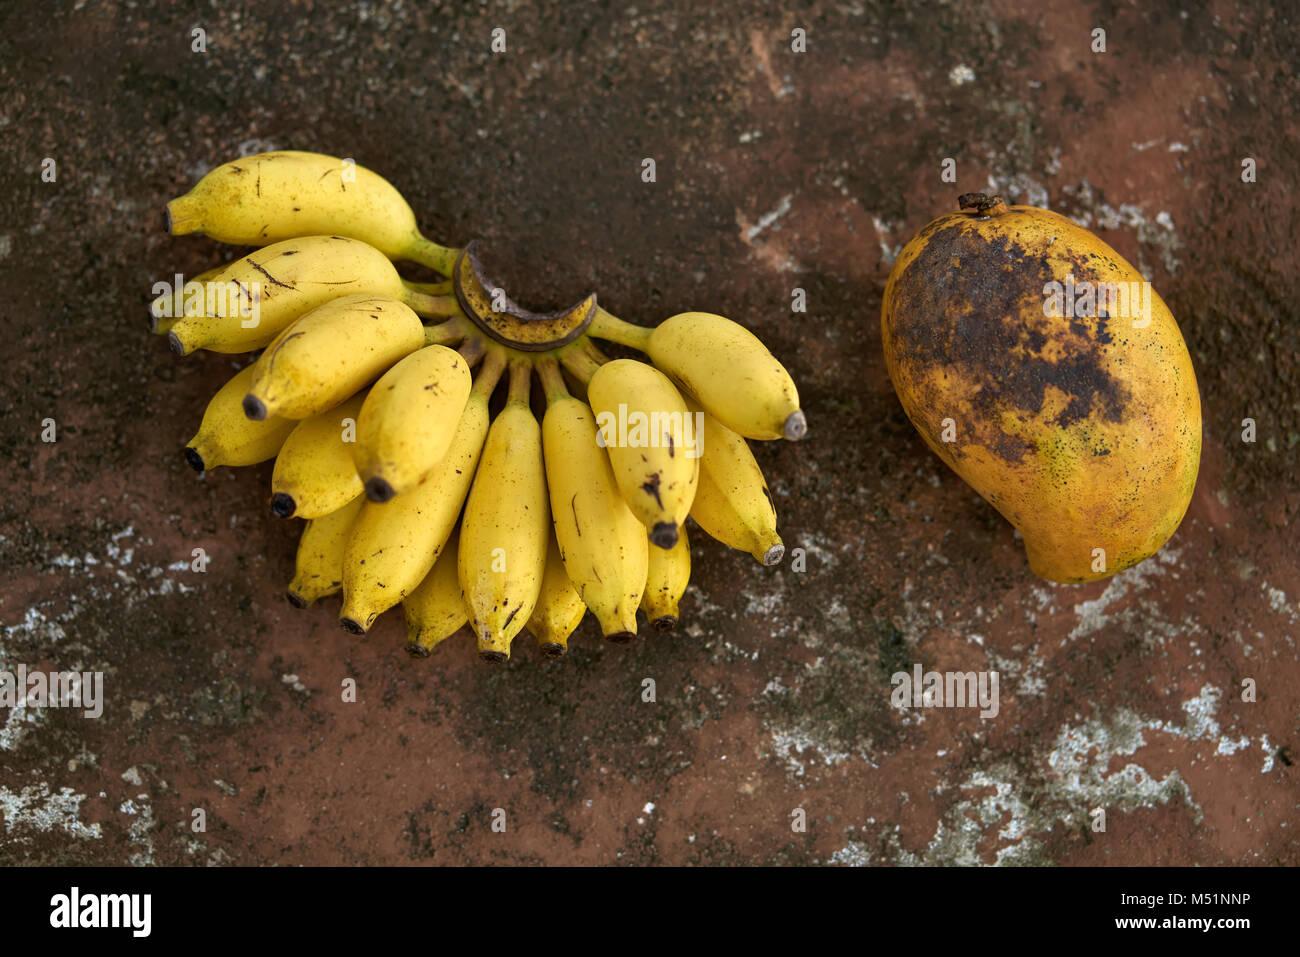 Bunte Bananen und Papaya Stockbild